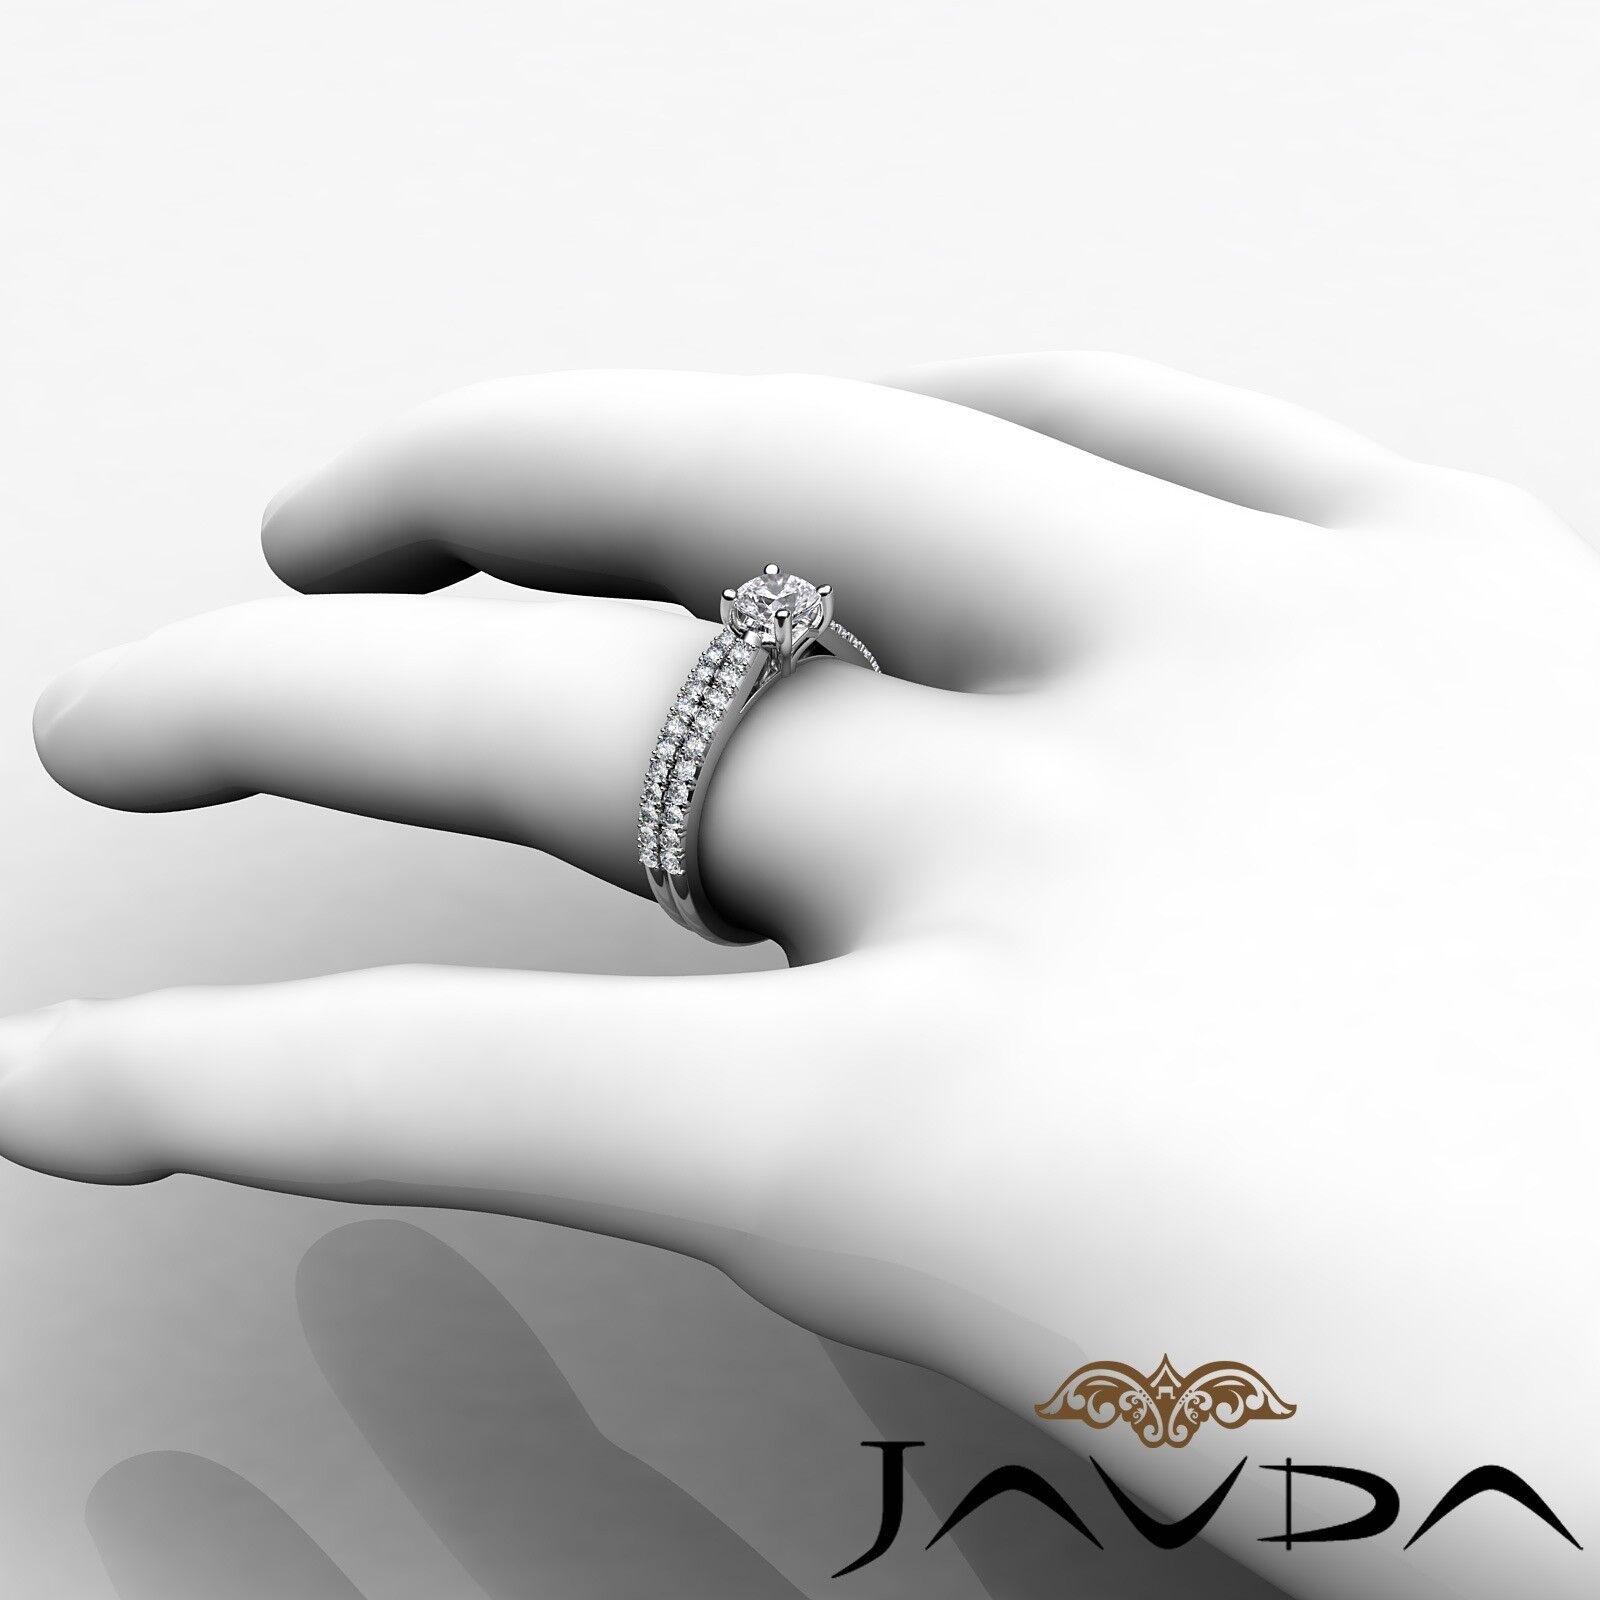 1.51ctw Double Prong Bridal Set Cushion Diamond Engagement Ring GIA F-VS1 W Gold 5